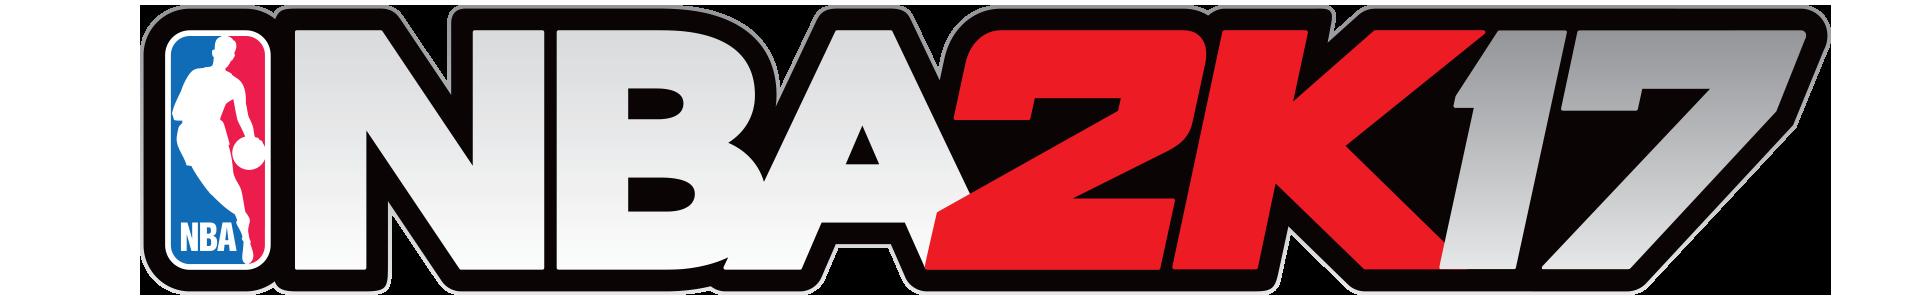 Nba 2k Logo Png.